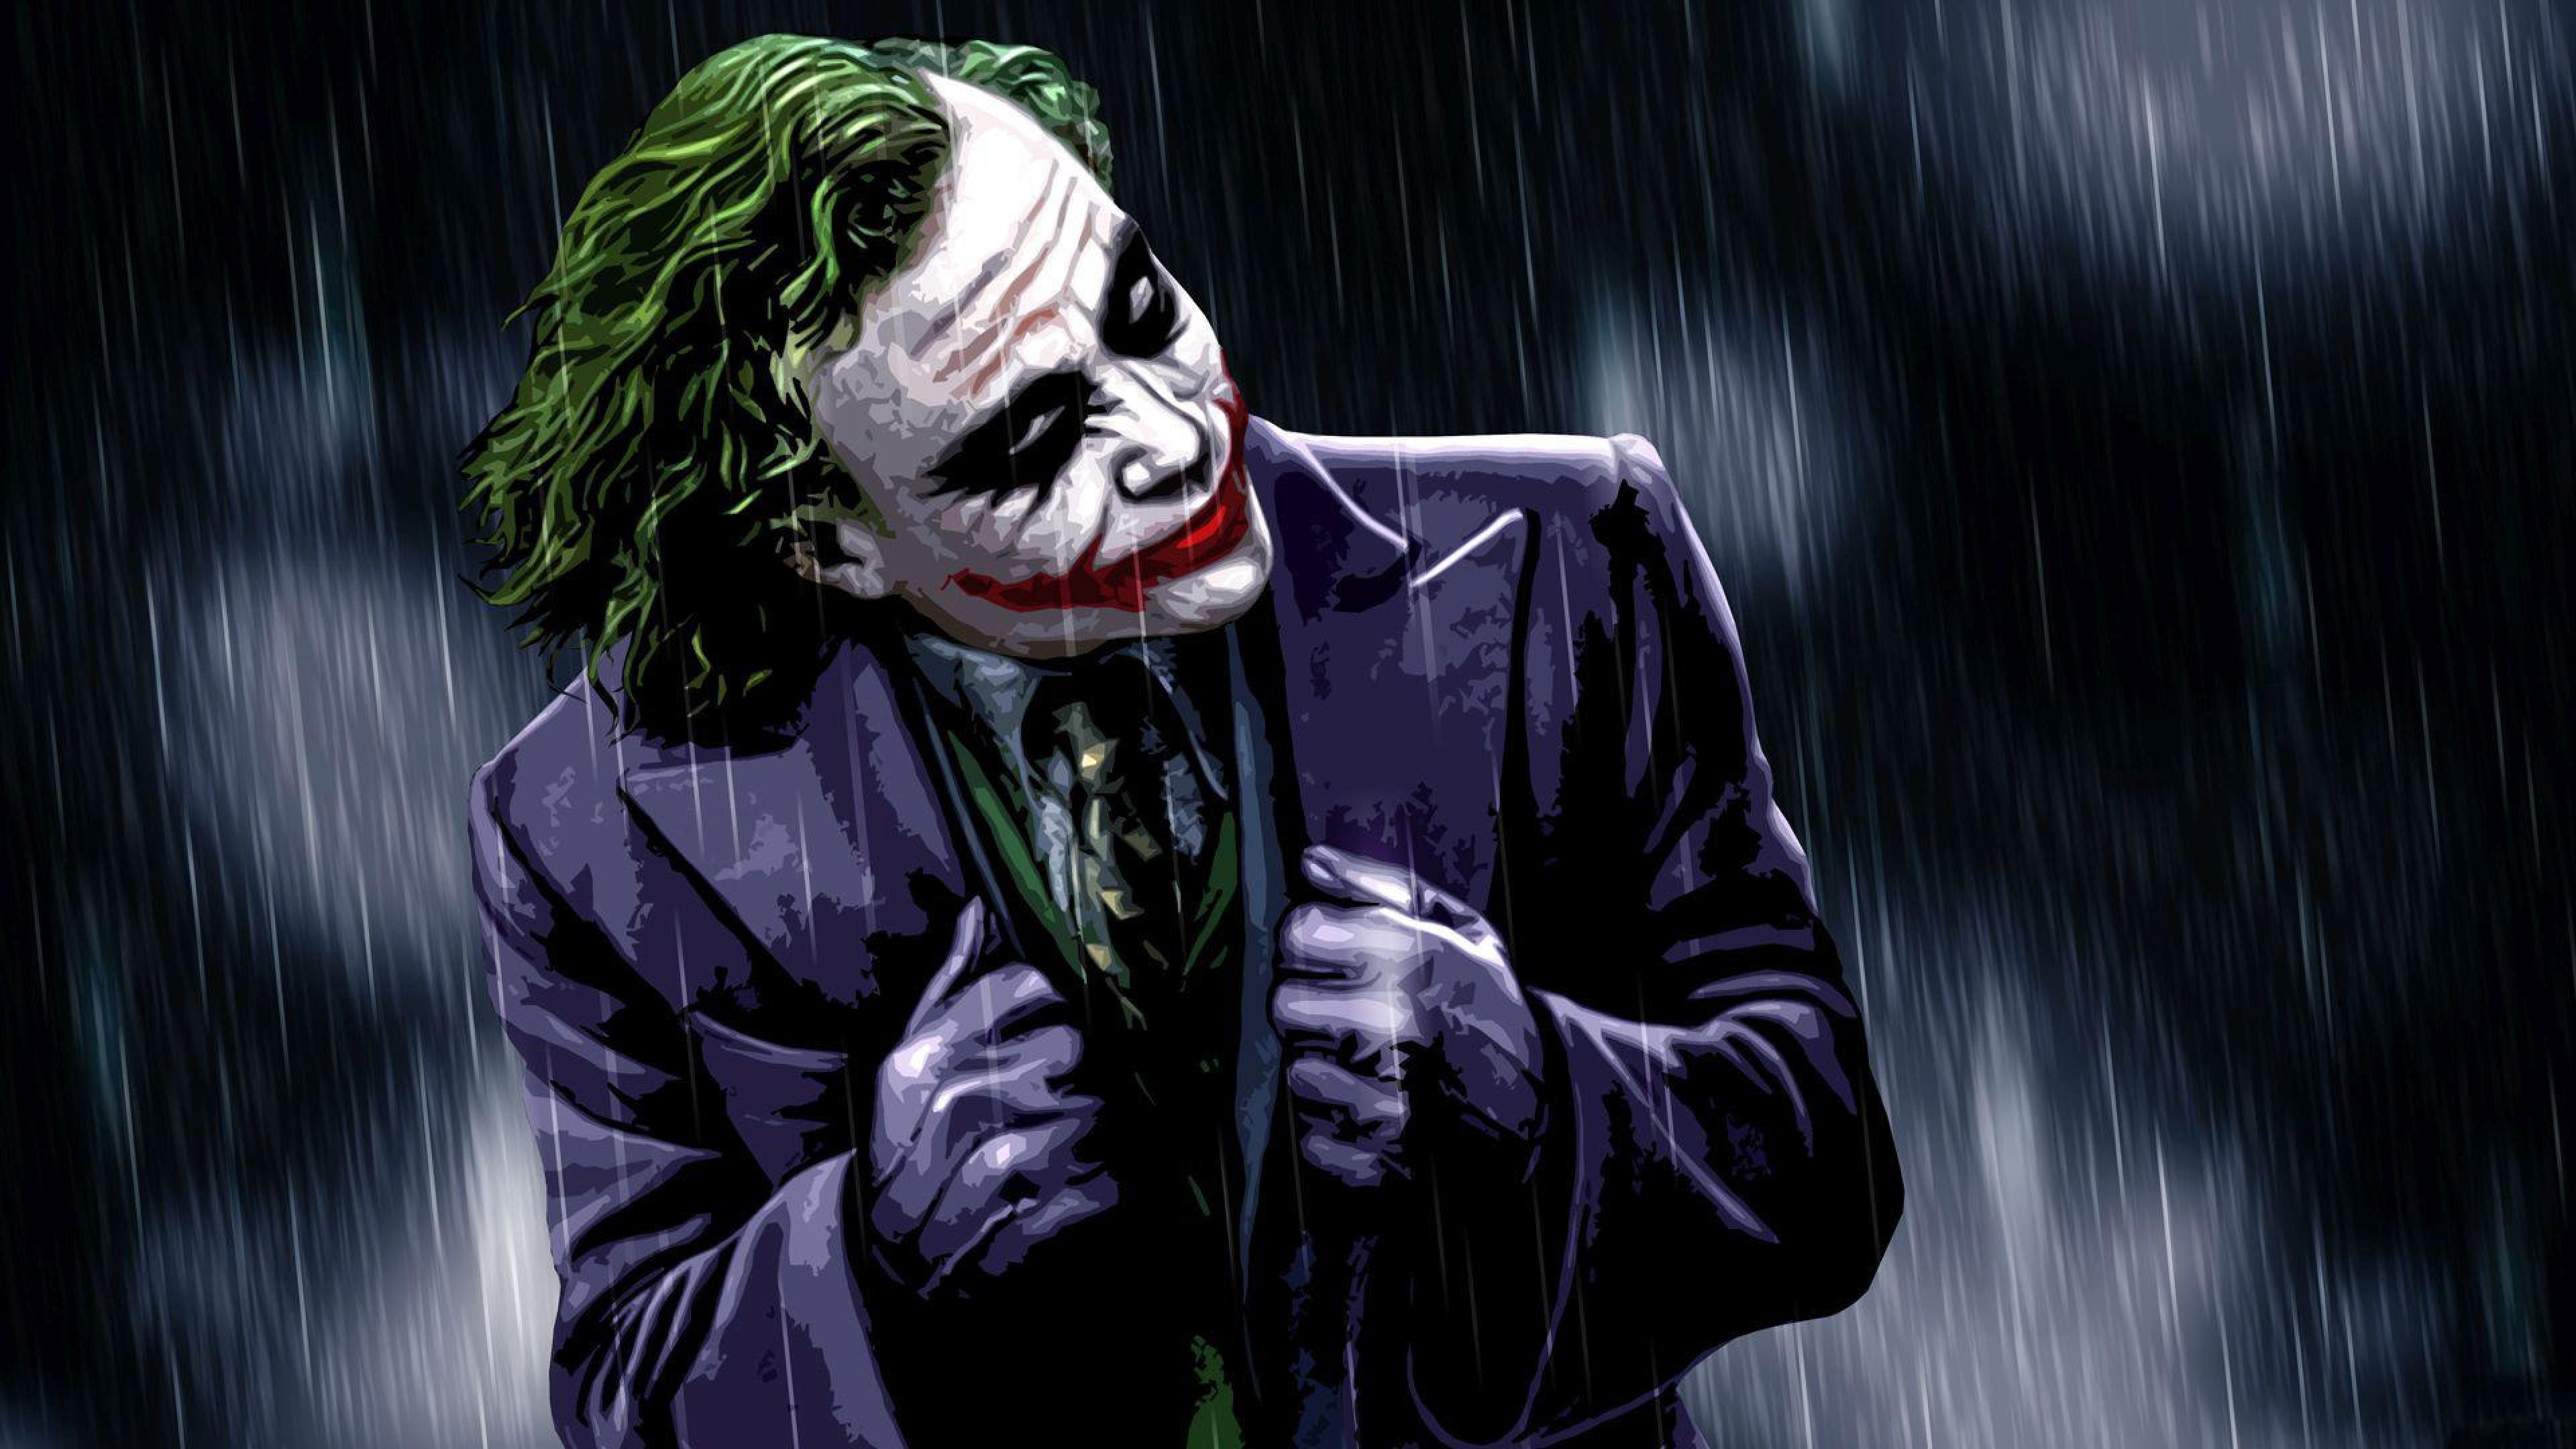 the joker supervillain 1536523624 - The Joker Supervillain - supervillain wallpapers, joker wallpapers, hd-wallpapers, digital art wallpapers, artwork wallpapers, artist wallpapers, 4k-wallpapers